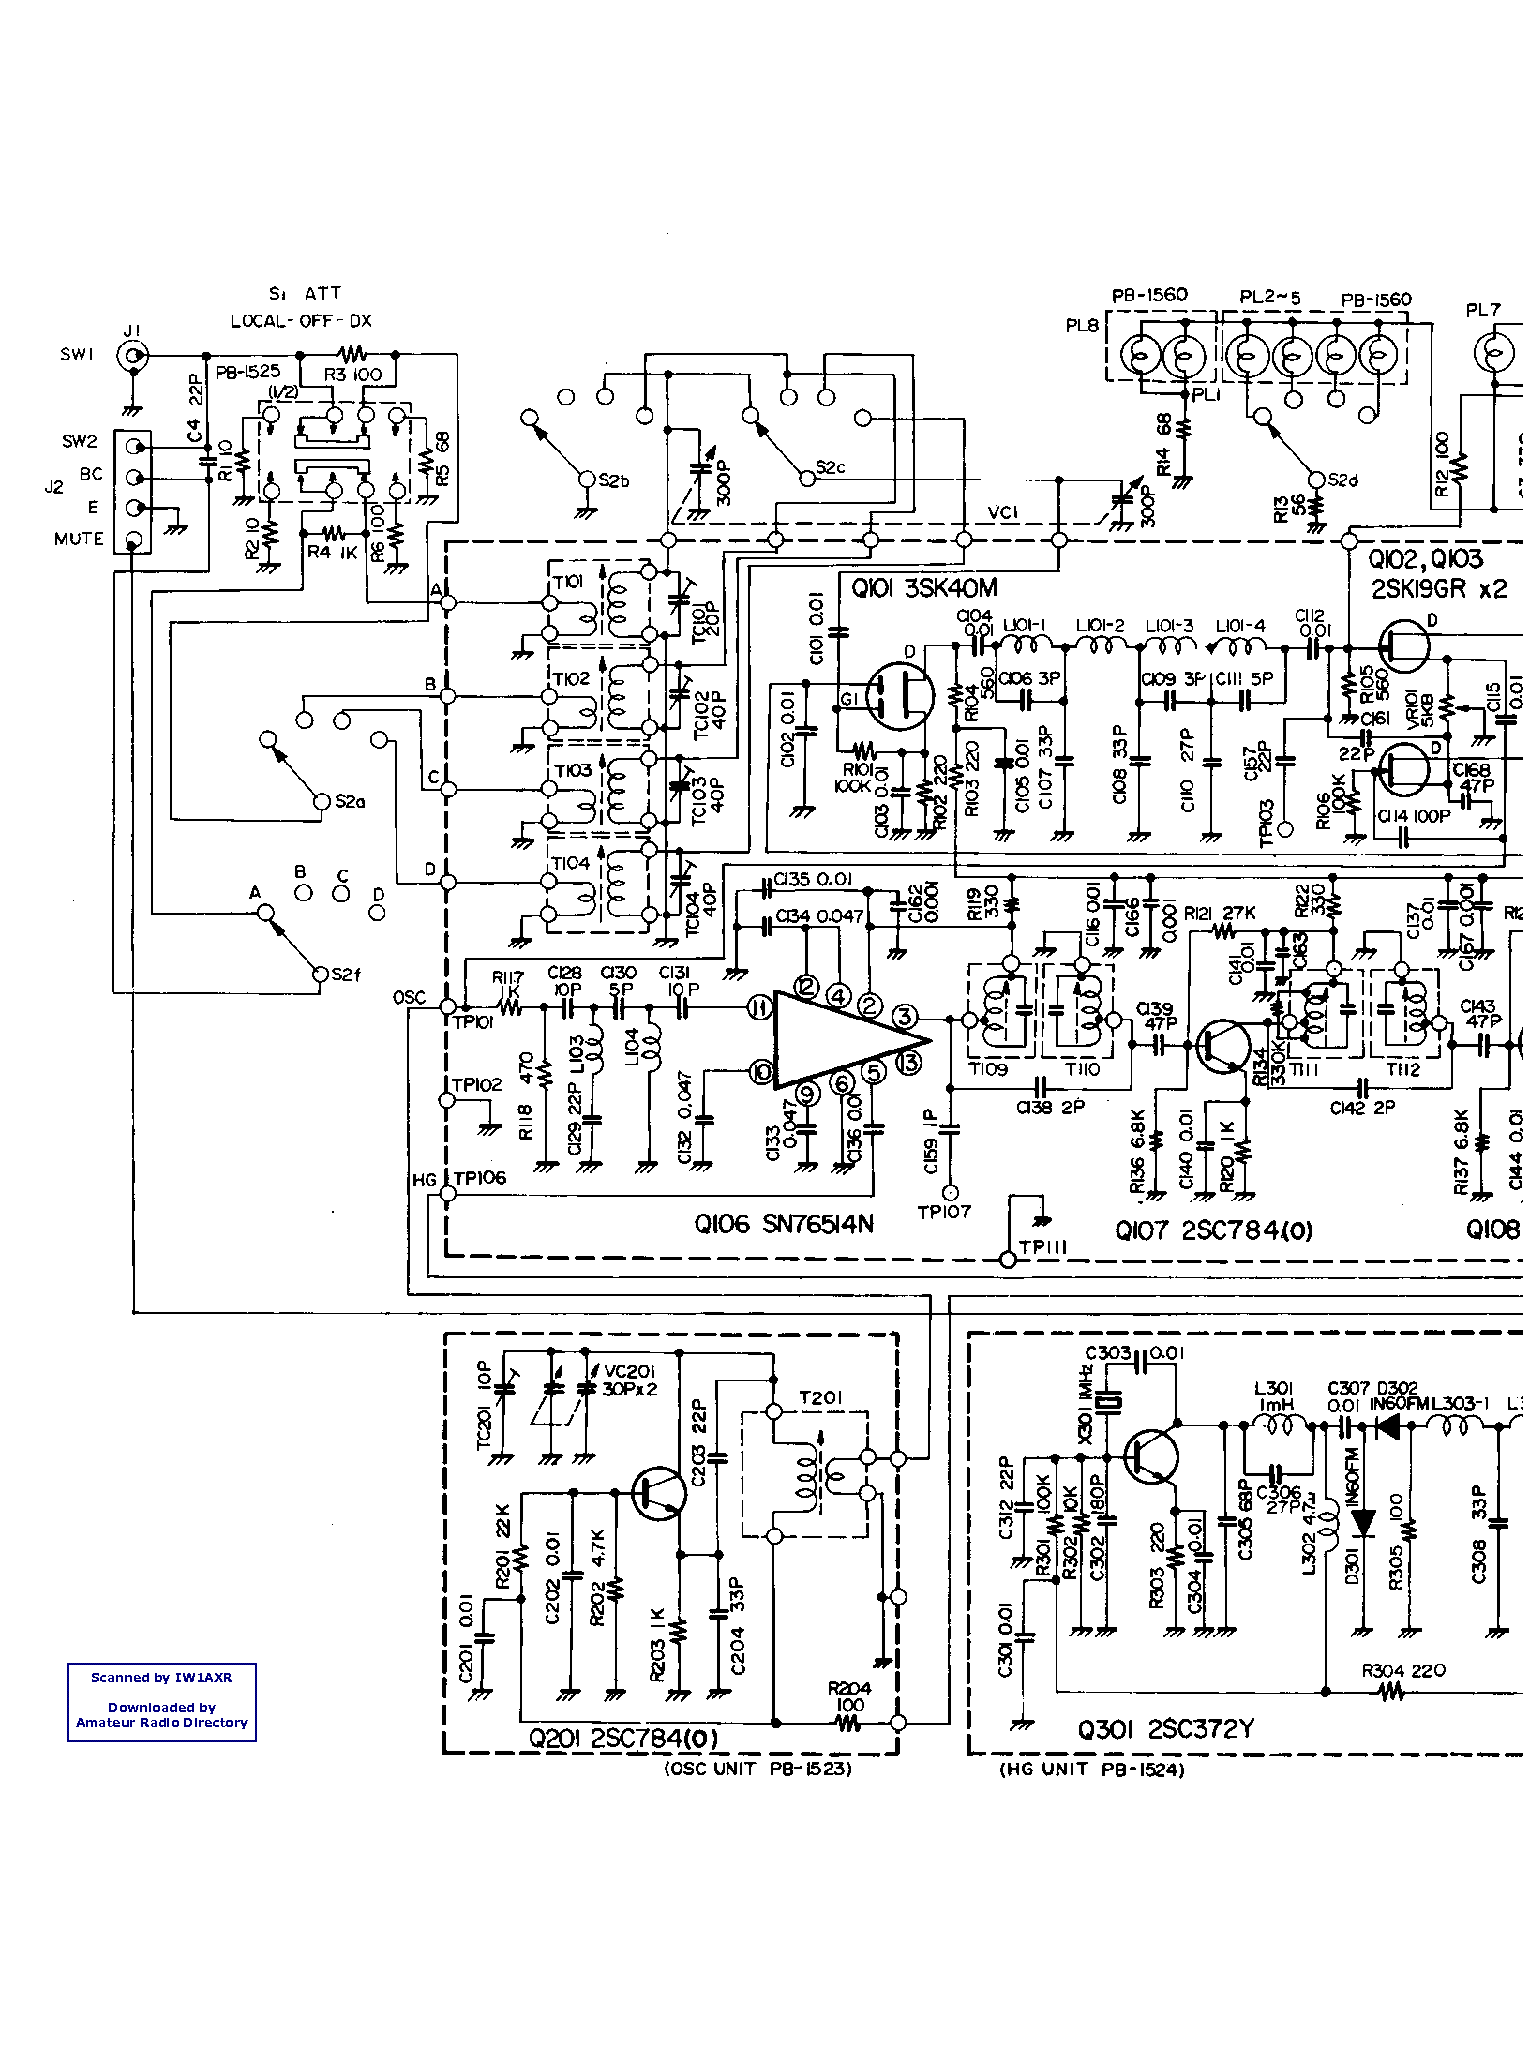 Yaesu frg-9600 service manual download manuals & technical.